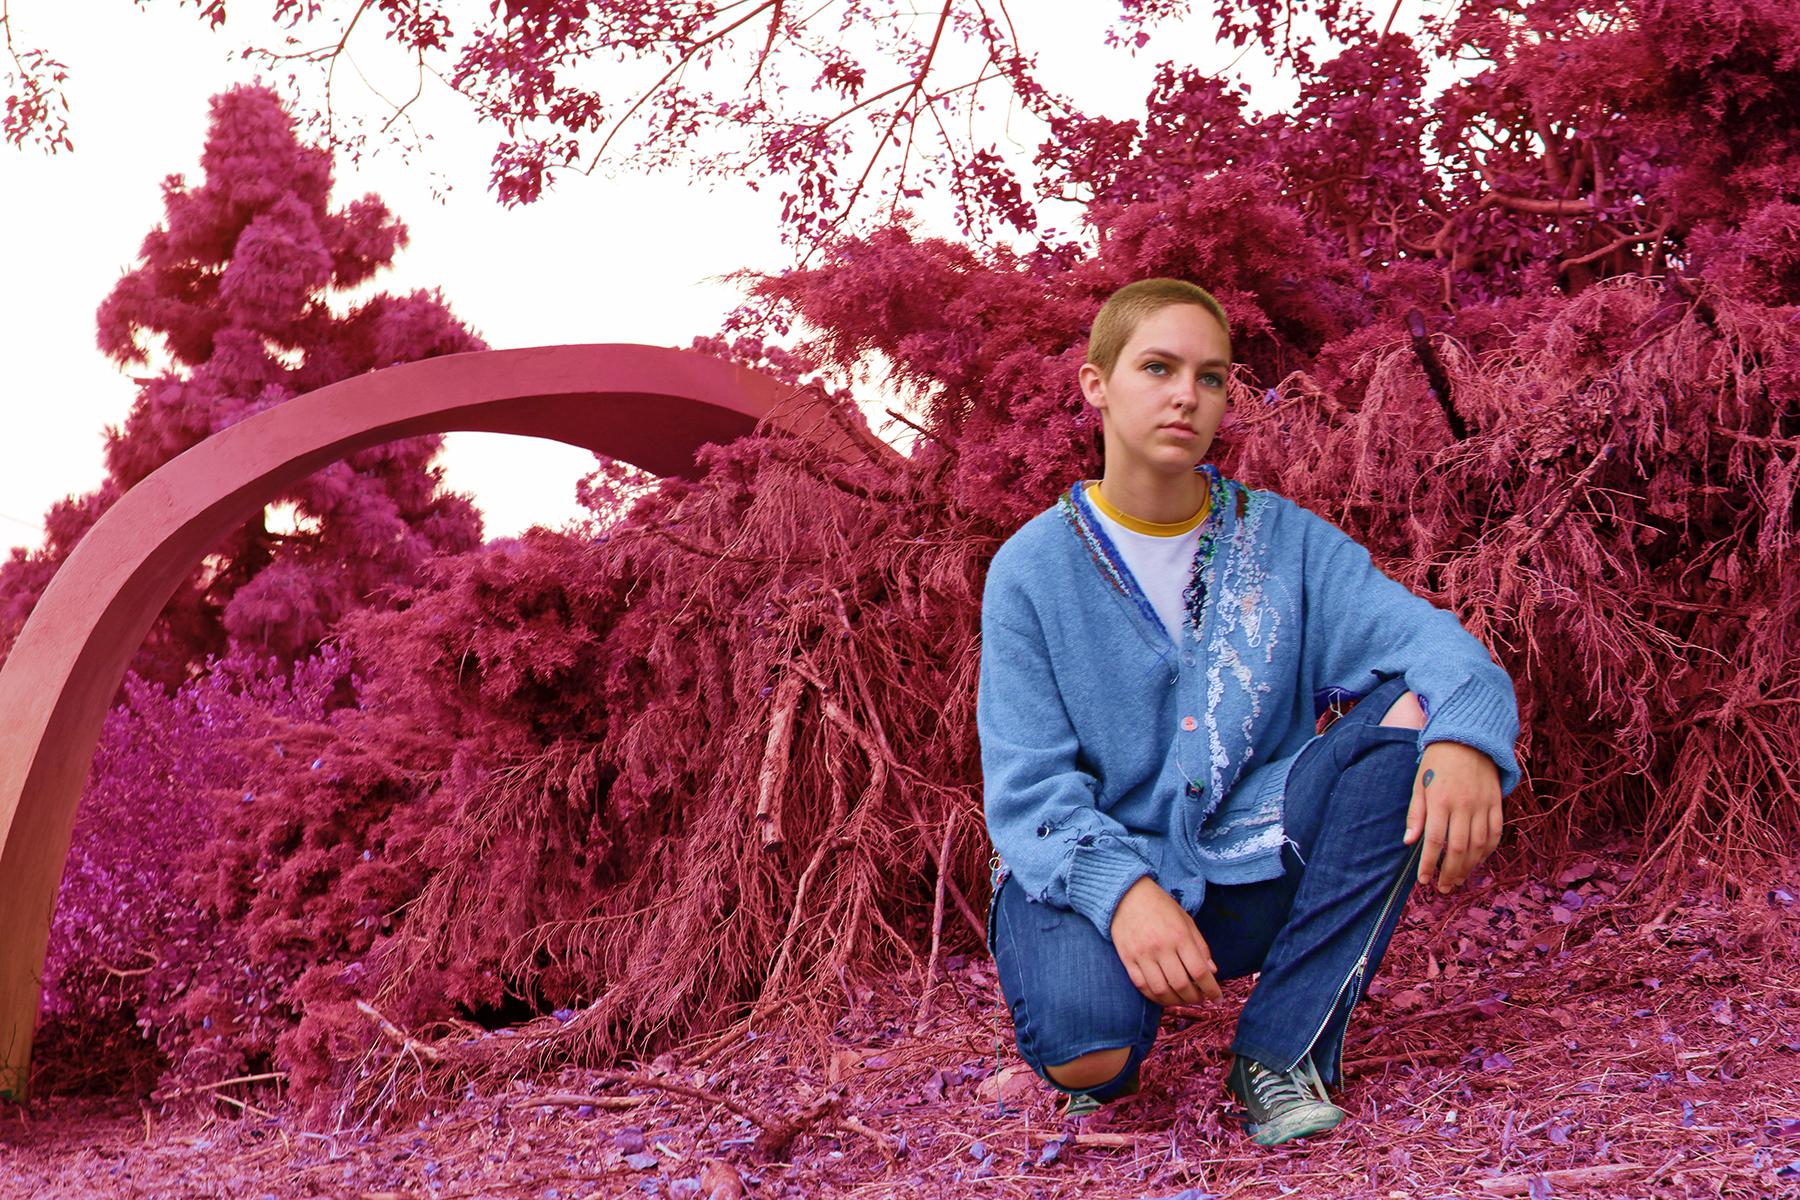 Nat_BlueCardigan_Pink Trees_1_Web.jpg